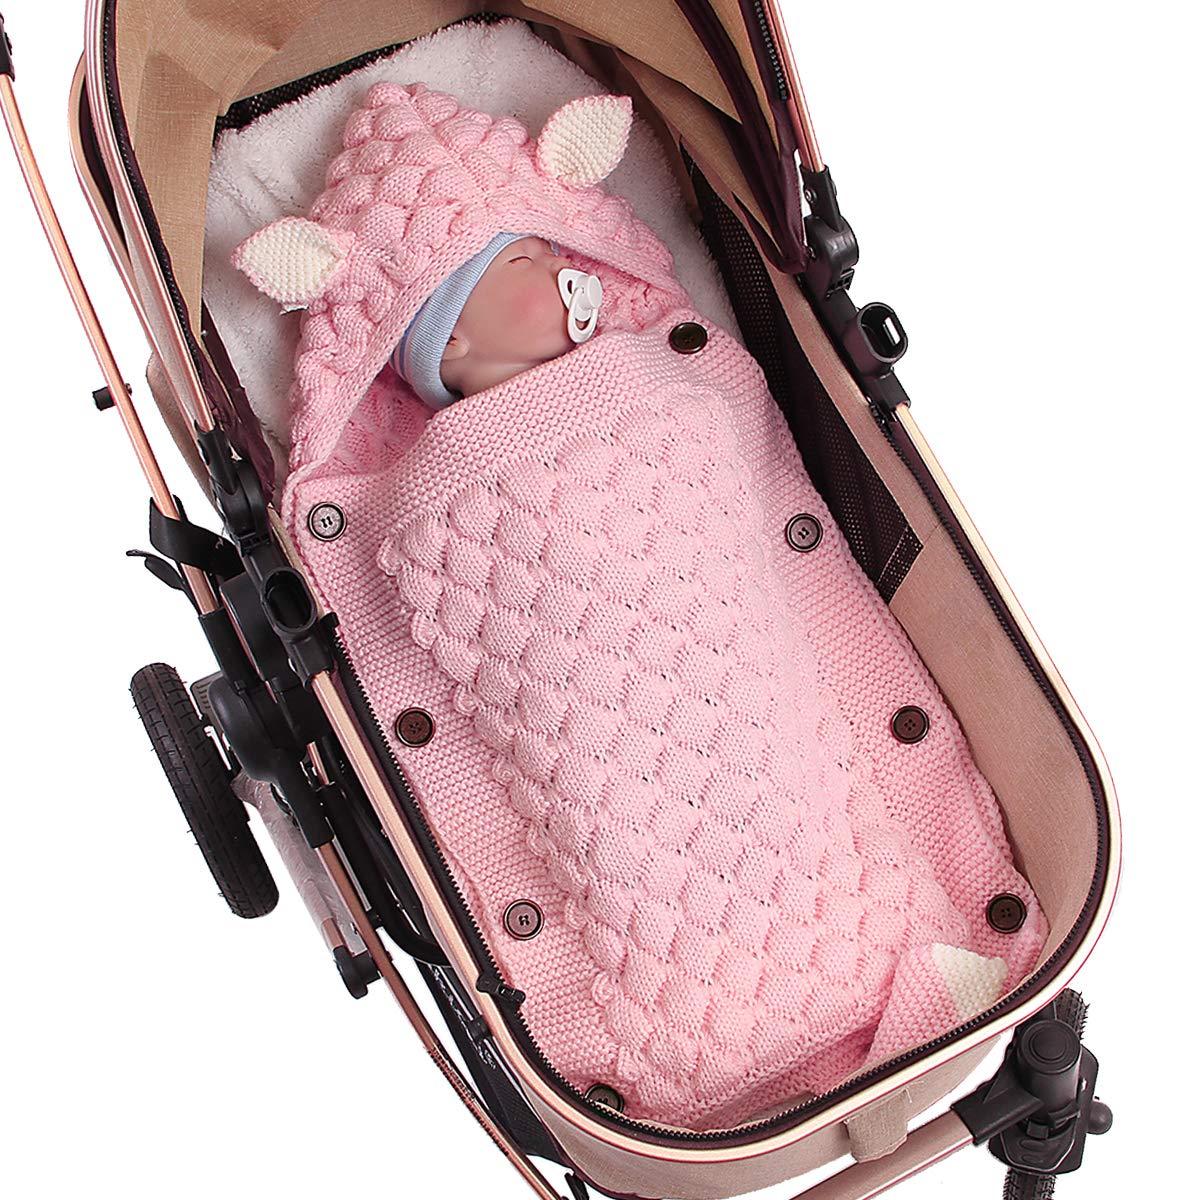 NCONCO Baby Knit Sleeping Bag, Swaddle Blanket Hooded Stroller Wrap for 0-12 Months Newborn Infant